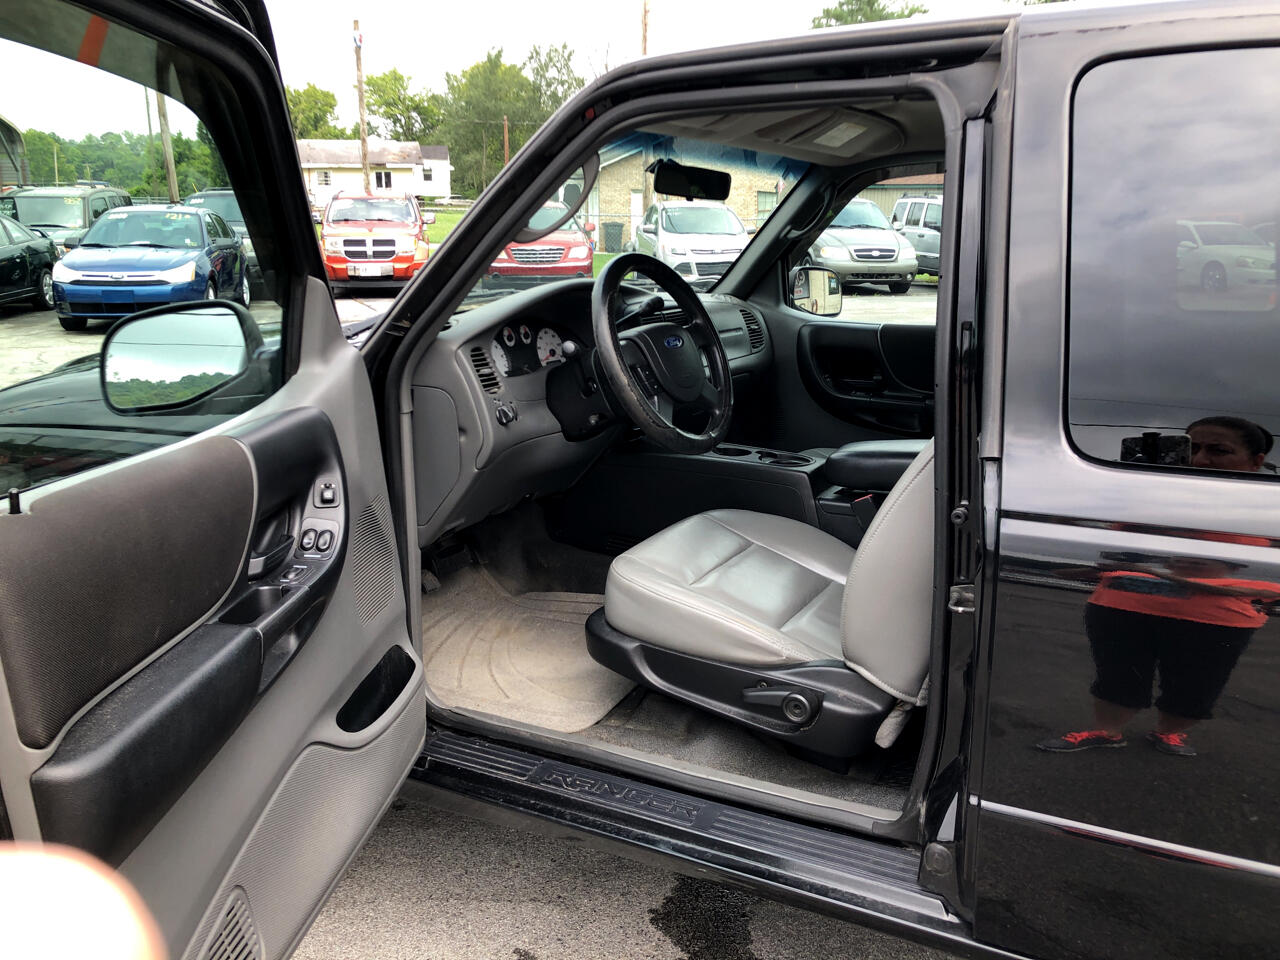 2004 Ford Ranger XLT SuperCab 3.0L AT 2WD